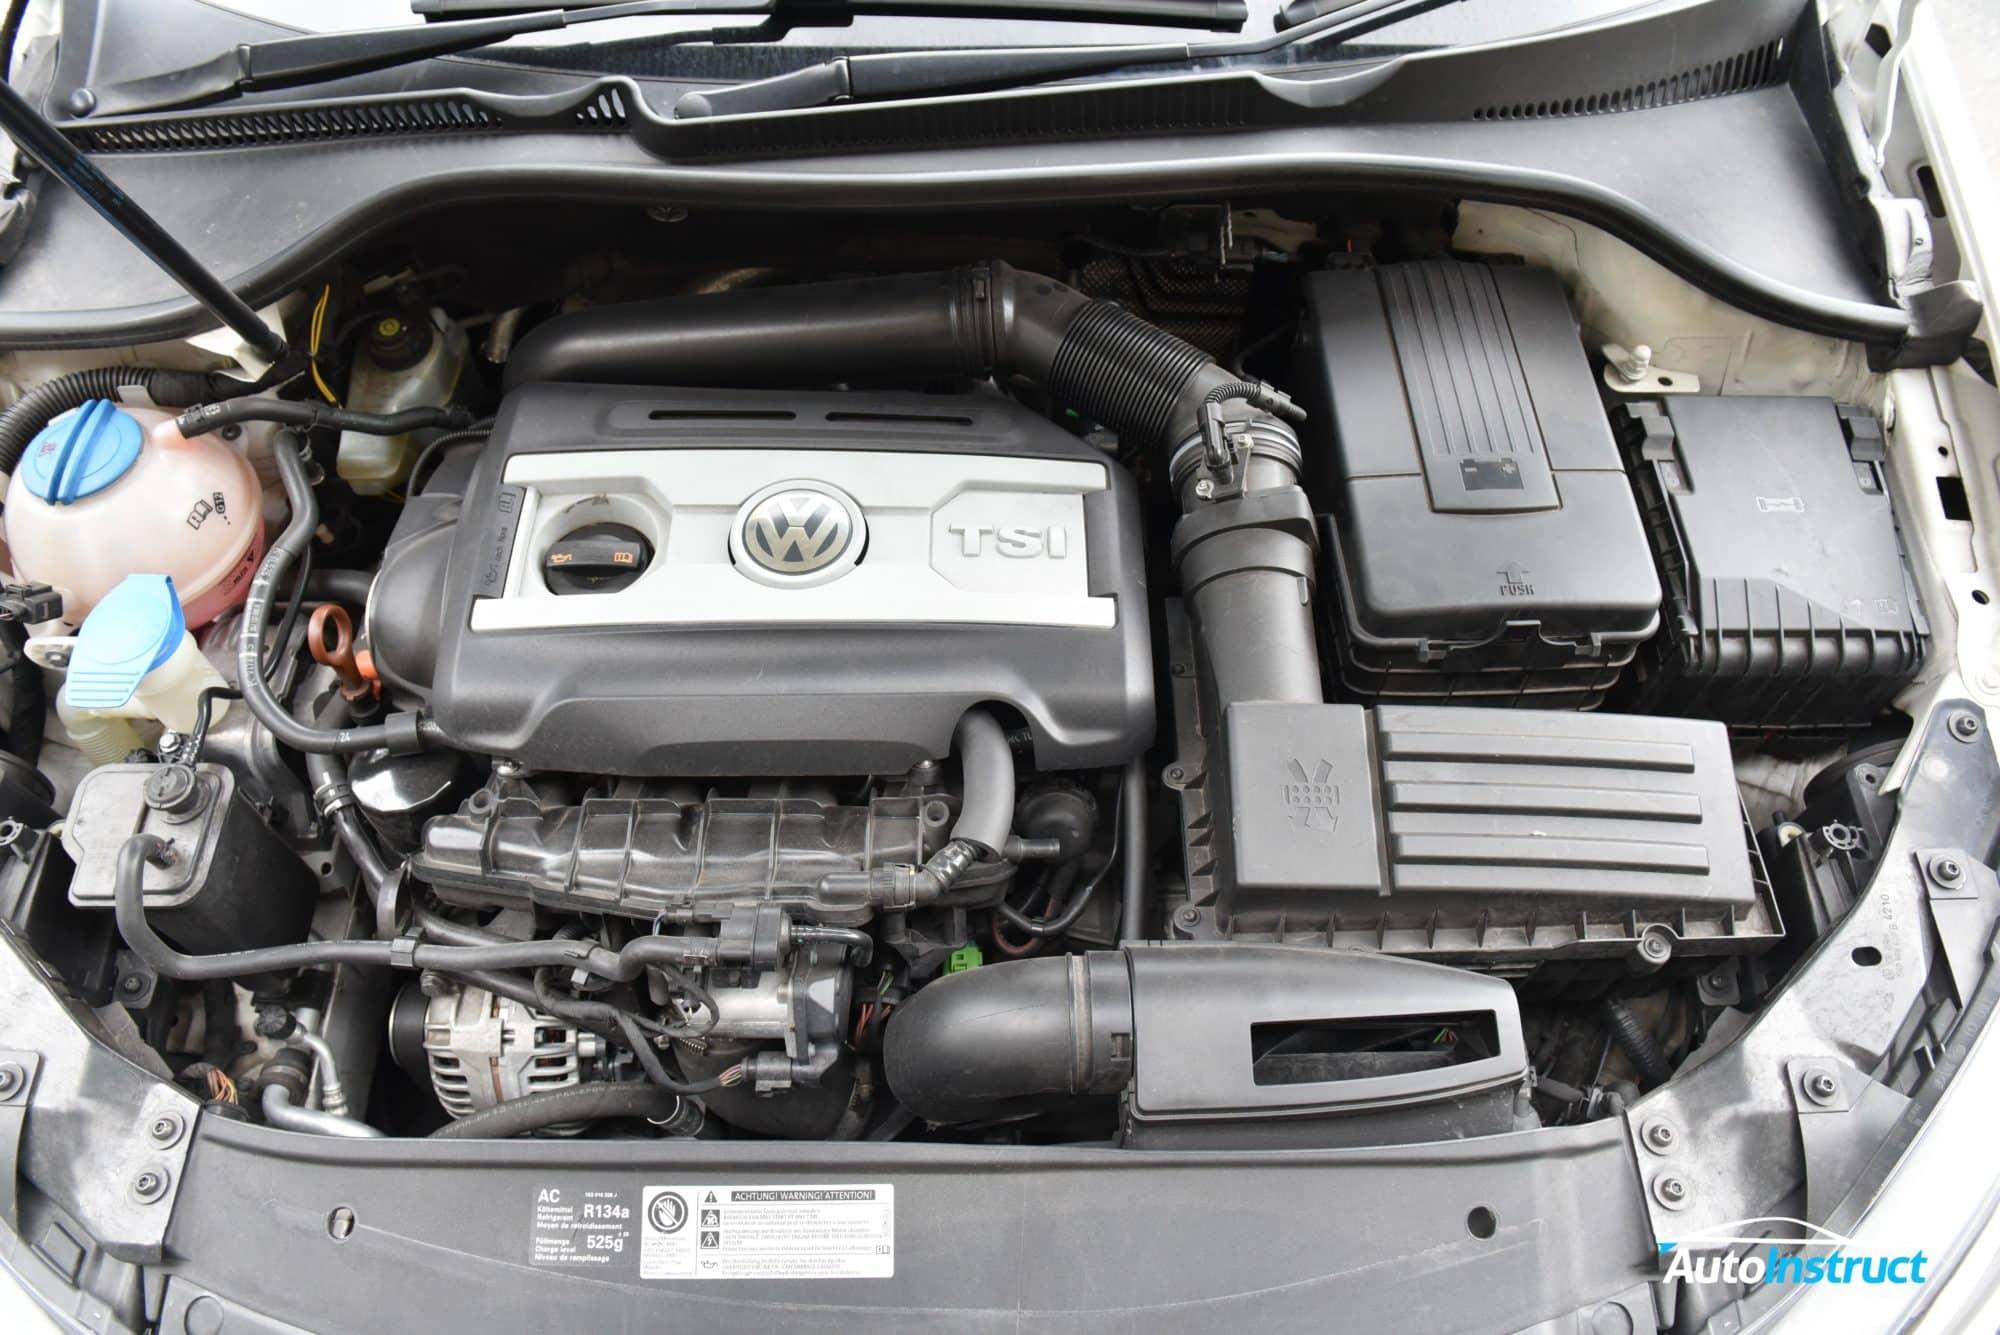 MK6 Golf Air Intake Removal